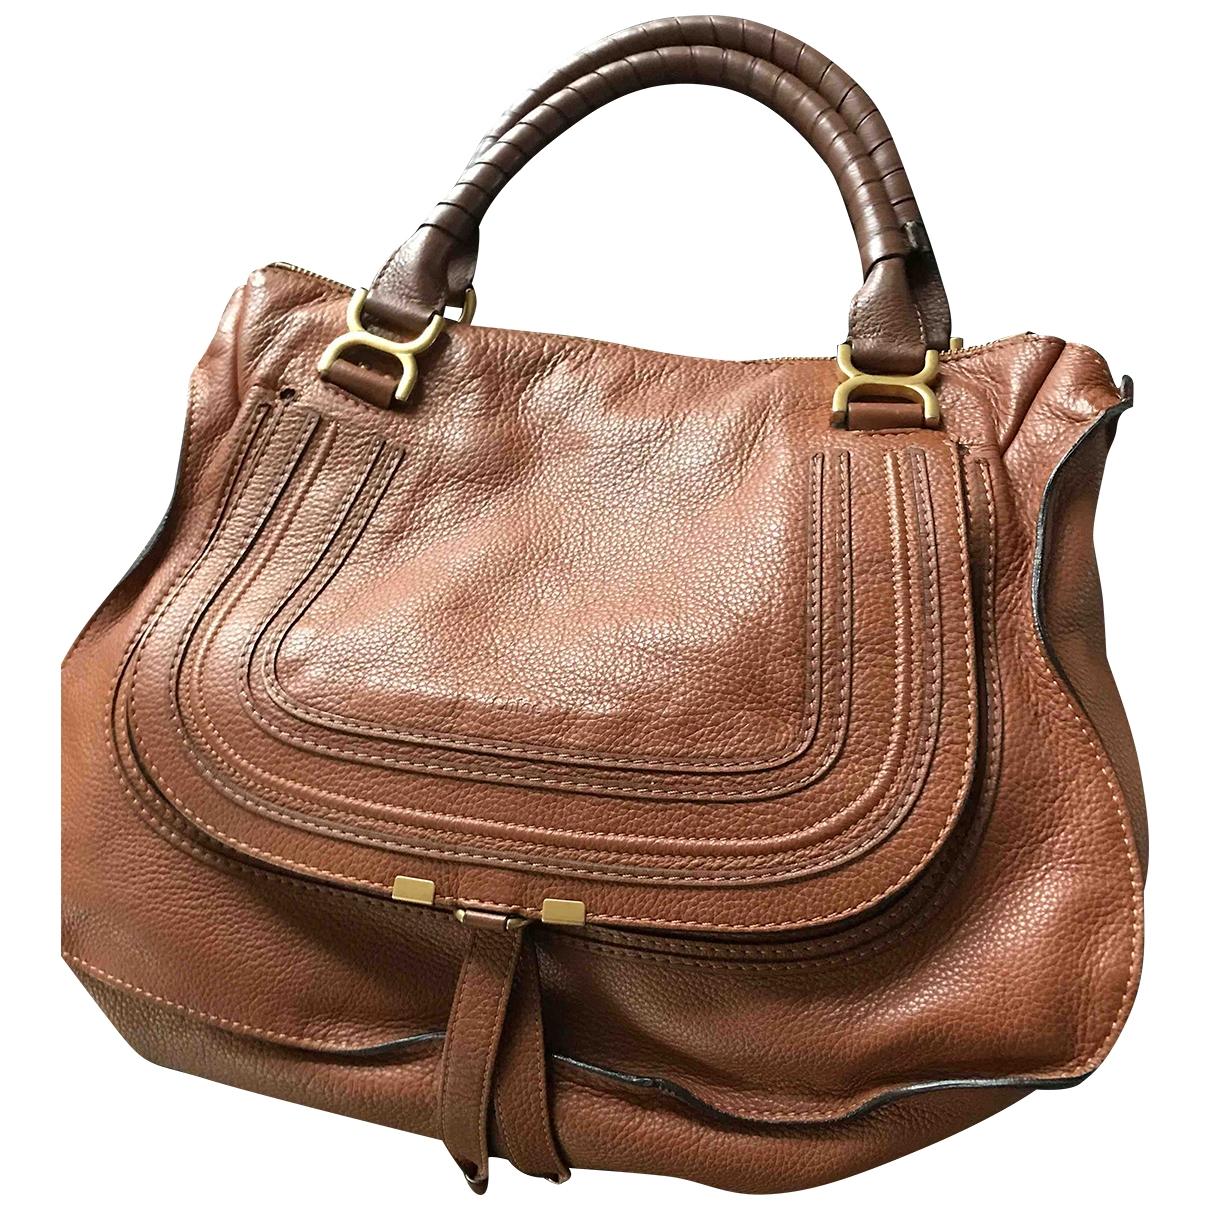 Chloé Marcie Brown Leather handbag for Women N